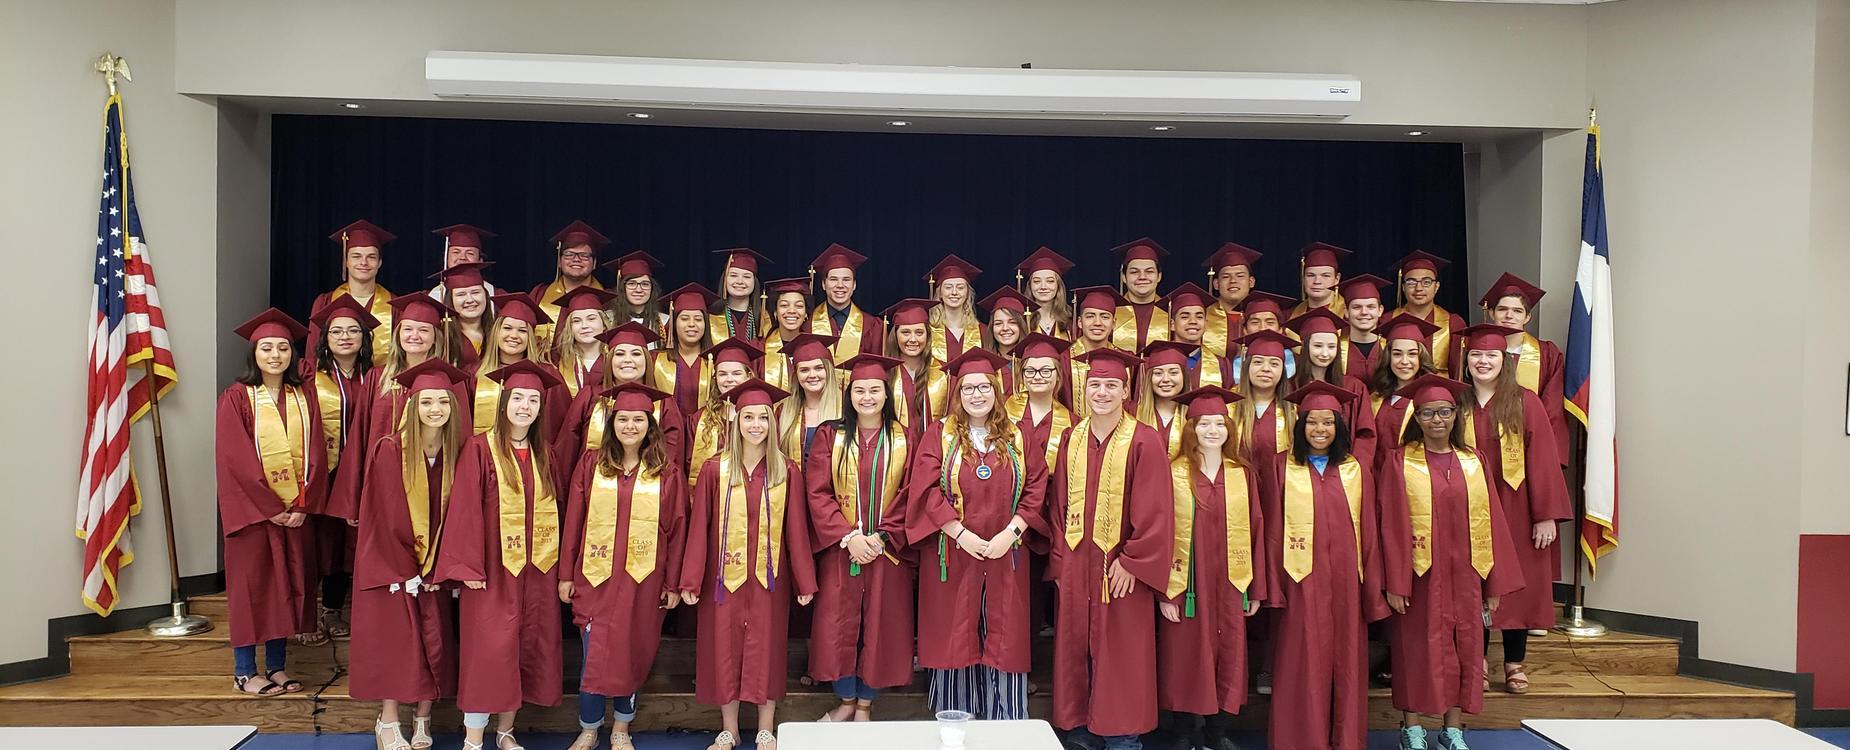 Williams Elementary Alumni - Magnolia West High School Class of 2019